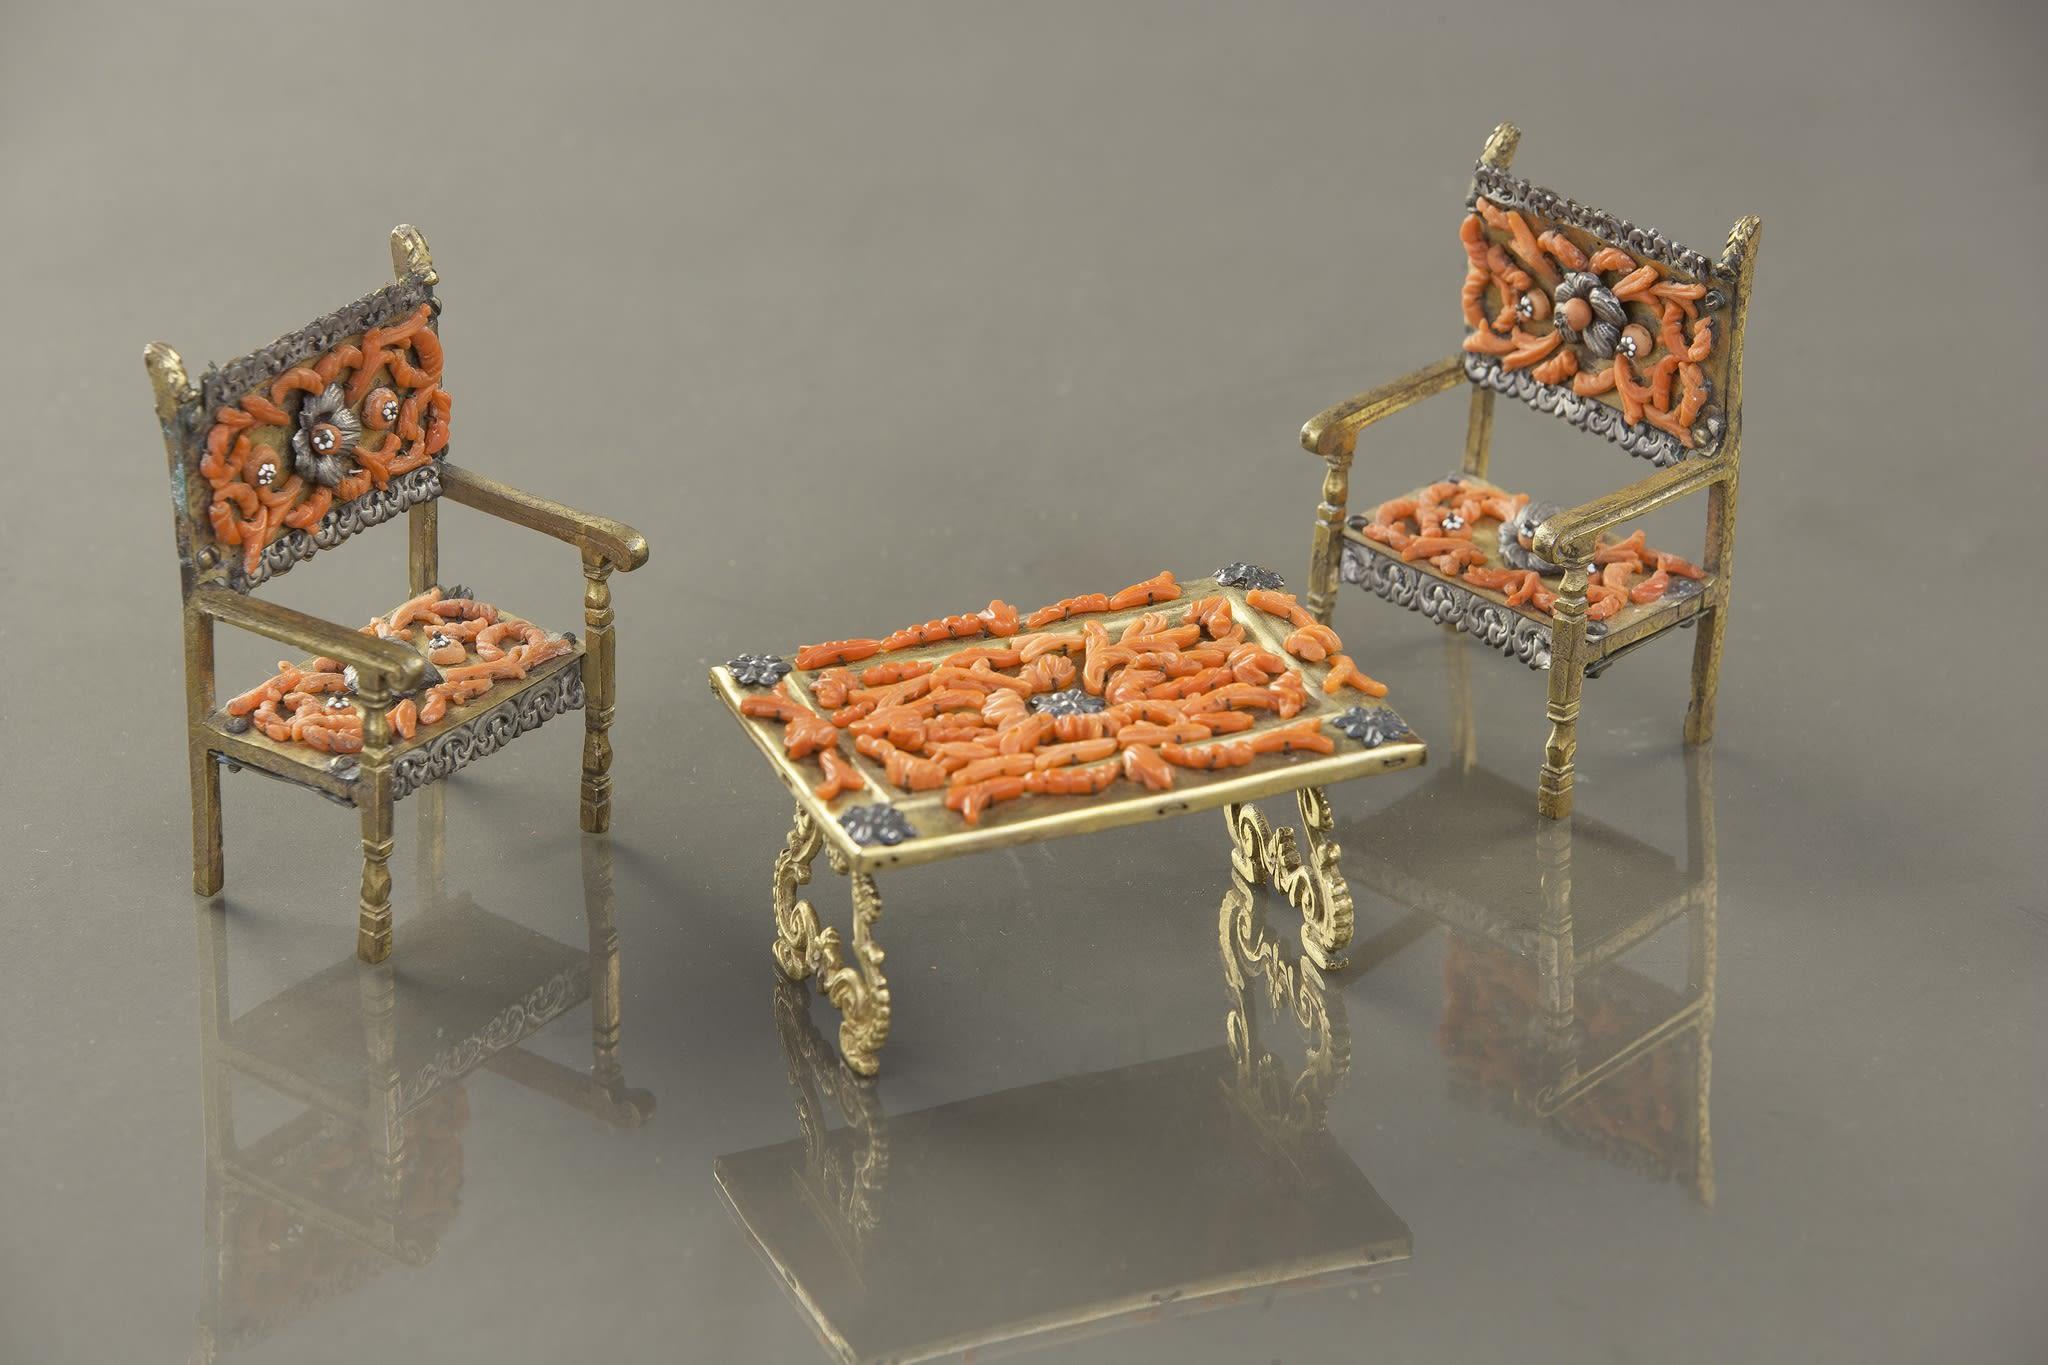 https://artlogic-res.cloudinary.com/w_2400,h_2400,c_limit,f_auto,fl_lossy,q_auto/artlogicstorage/brunfineart/images/view/0c566603301f59bc4b7c0d50763efc19d0ed6232/brunfineart-trapani-miniature-furniture-17th-18th-century.jpg